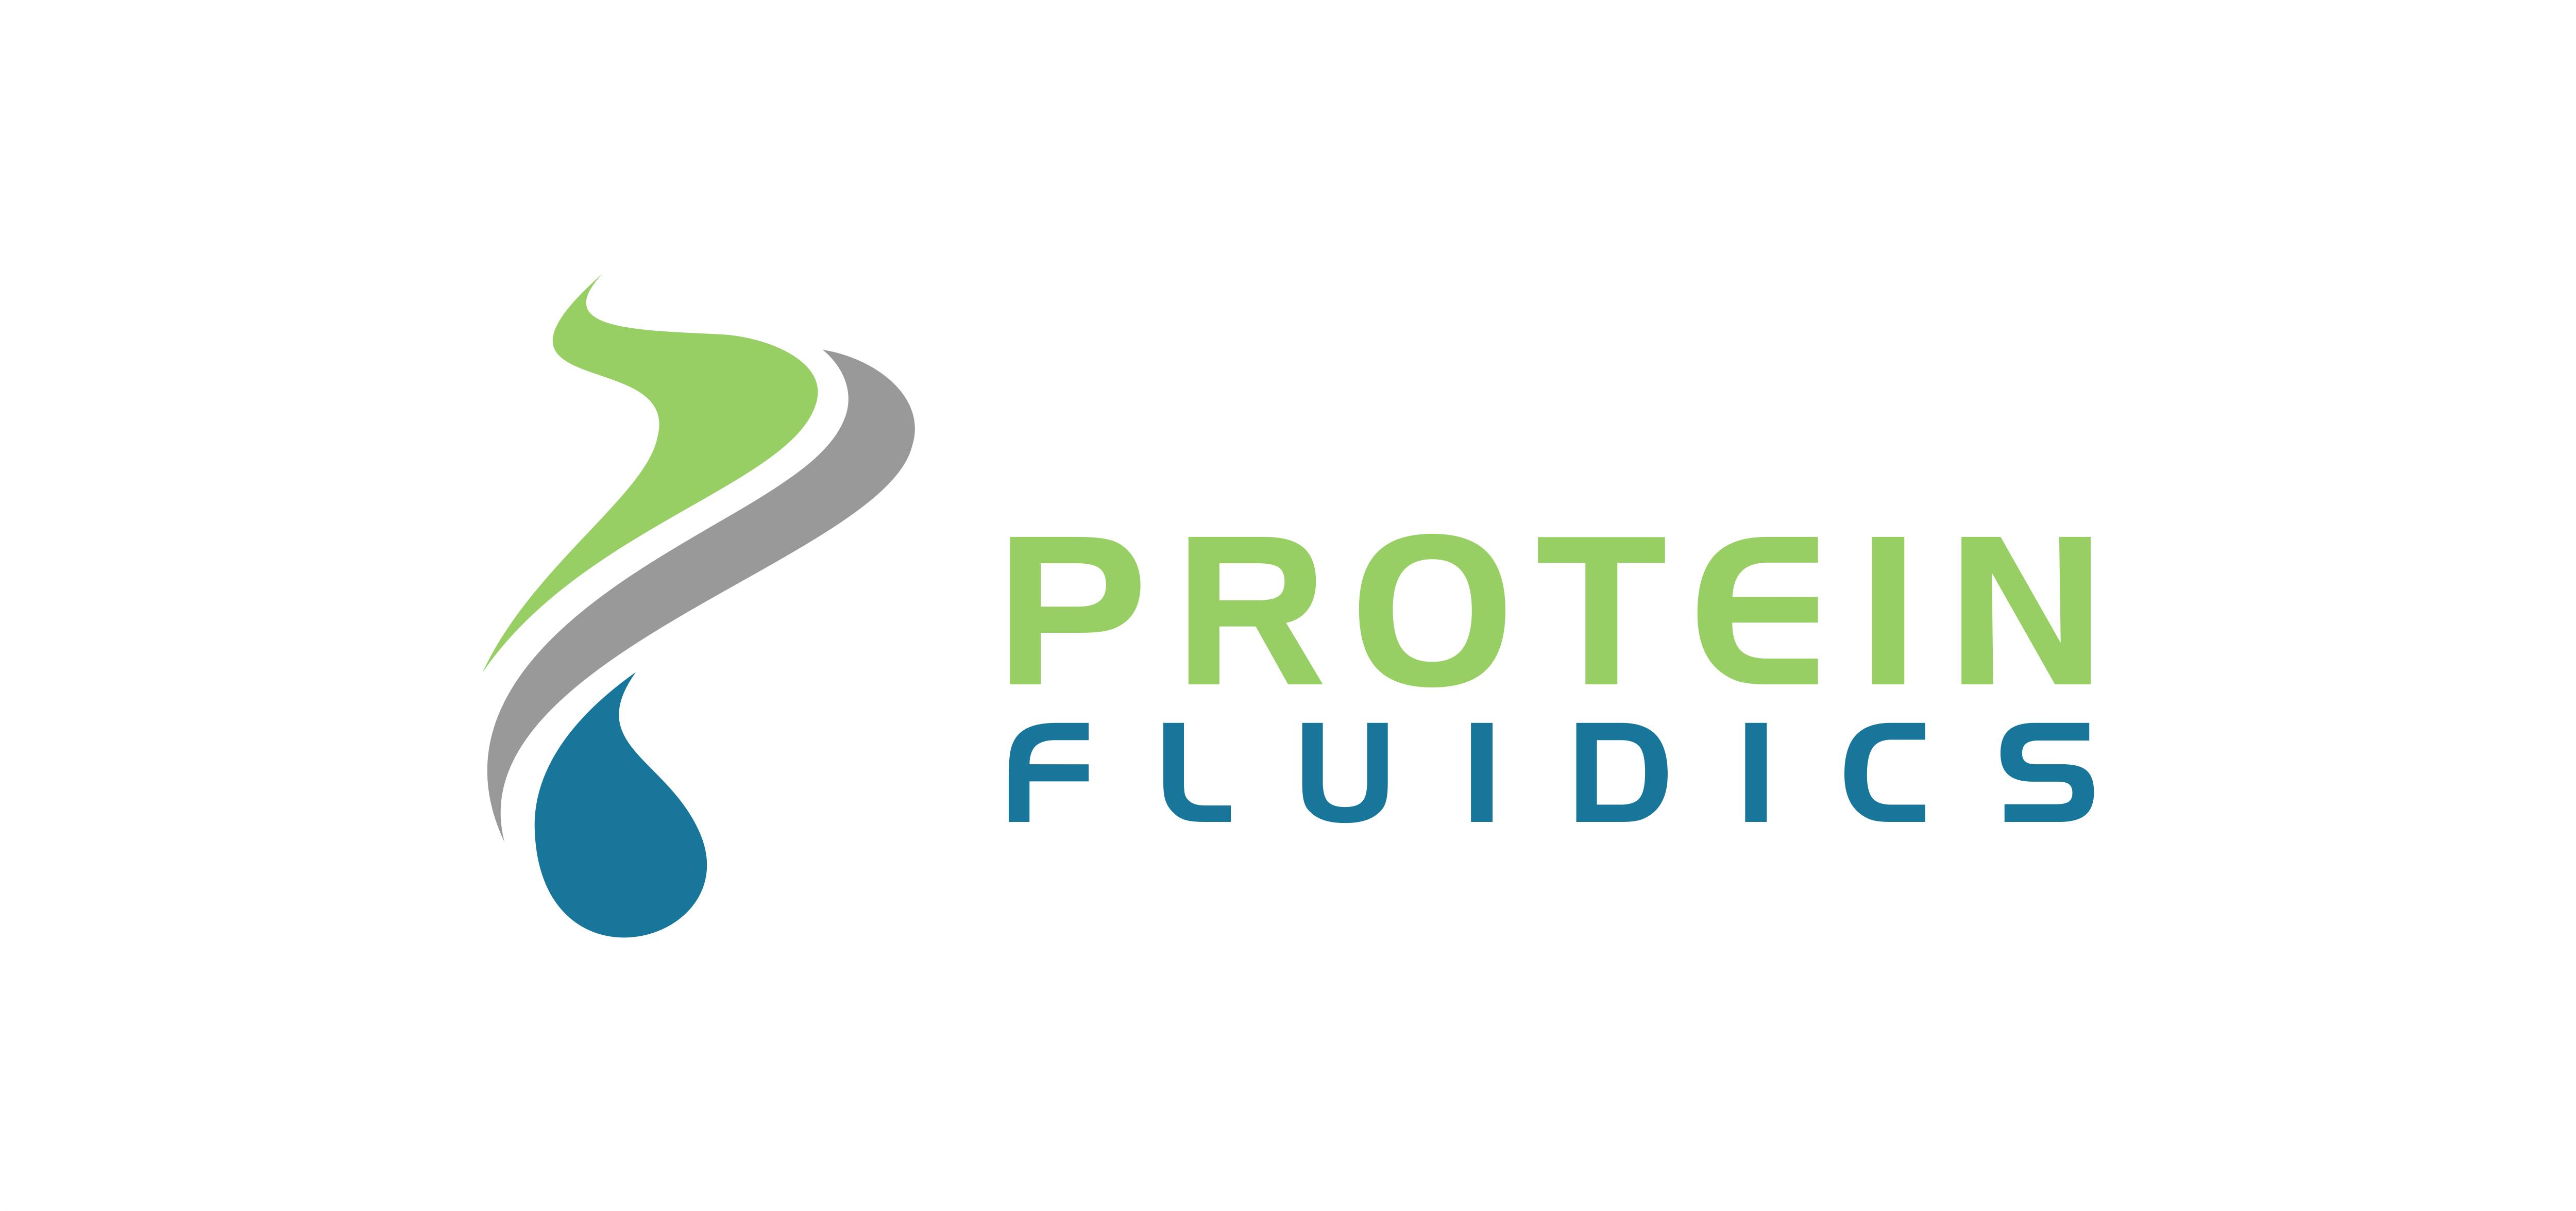 Create logo and branding for new biotech start-up